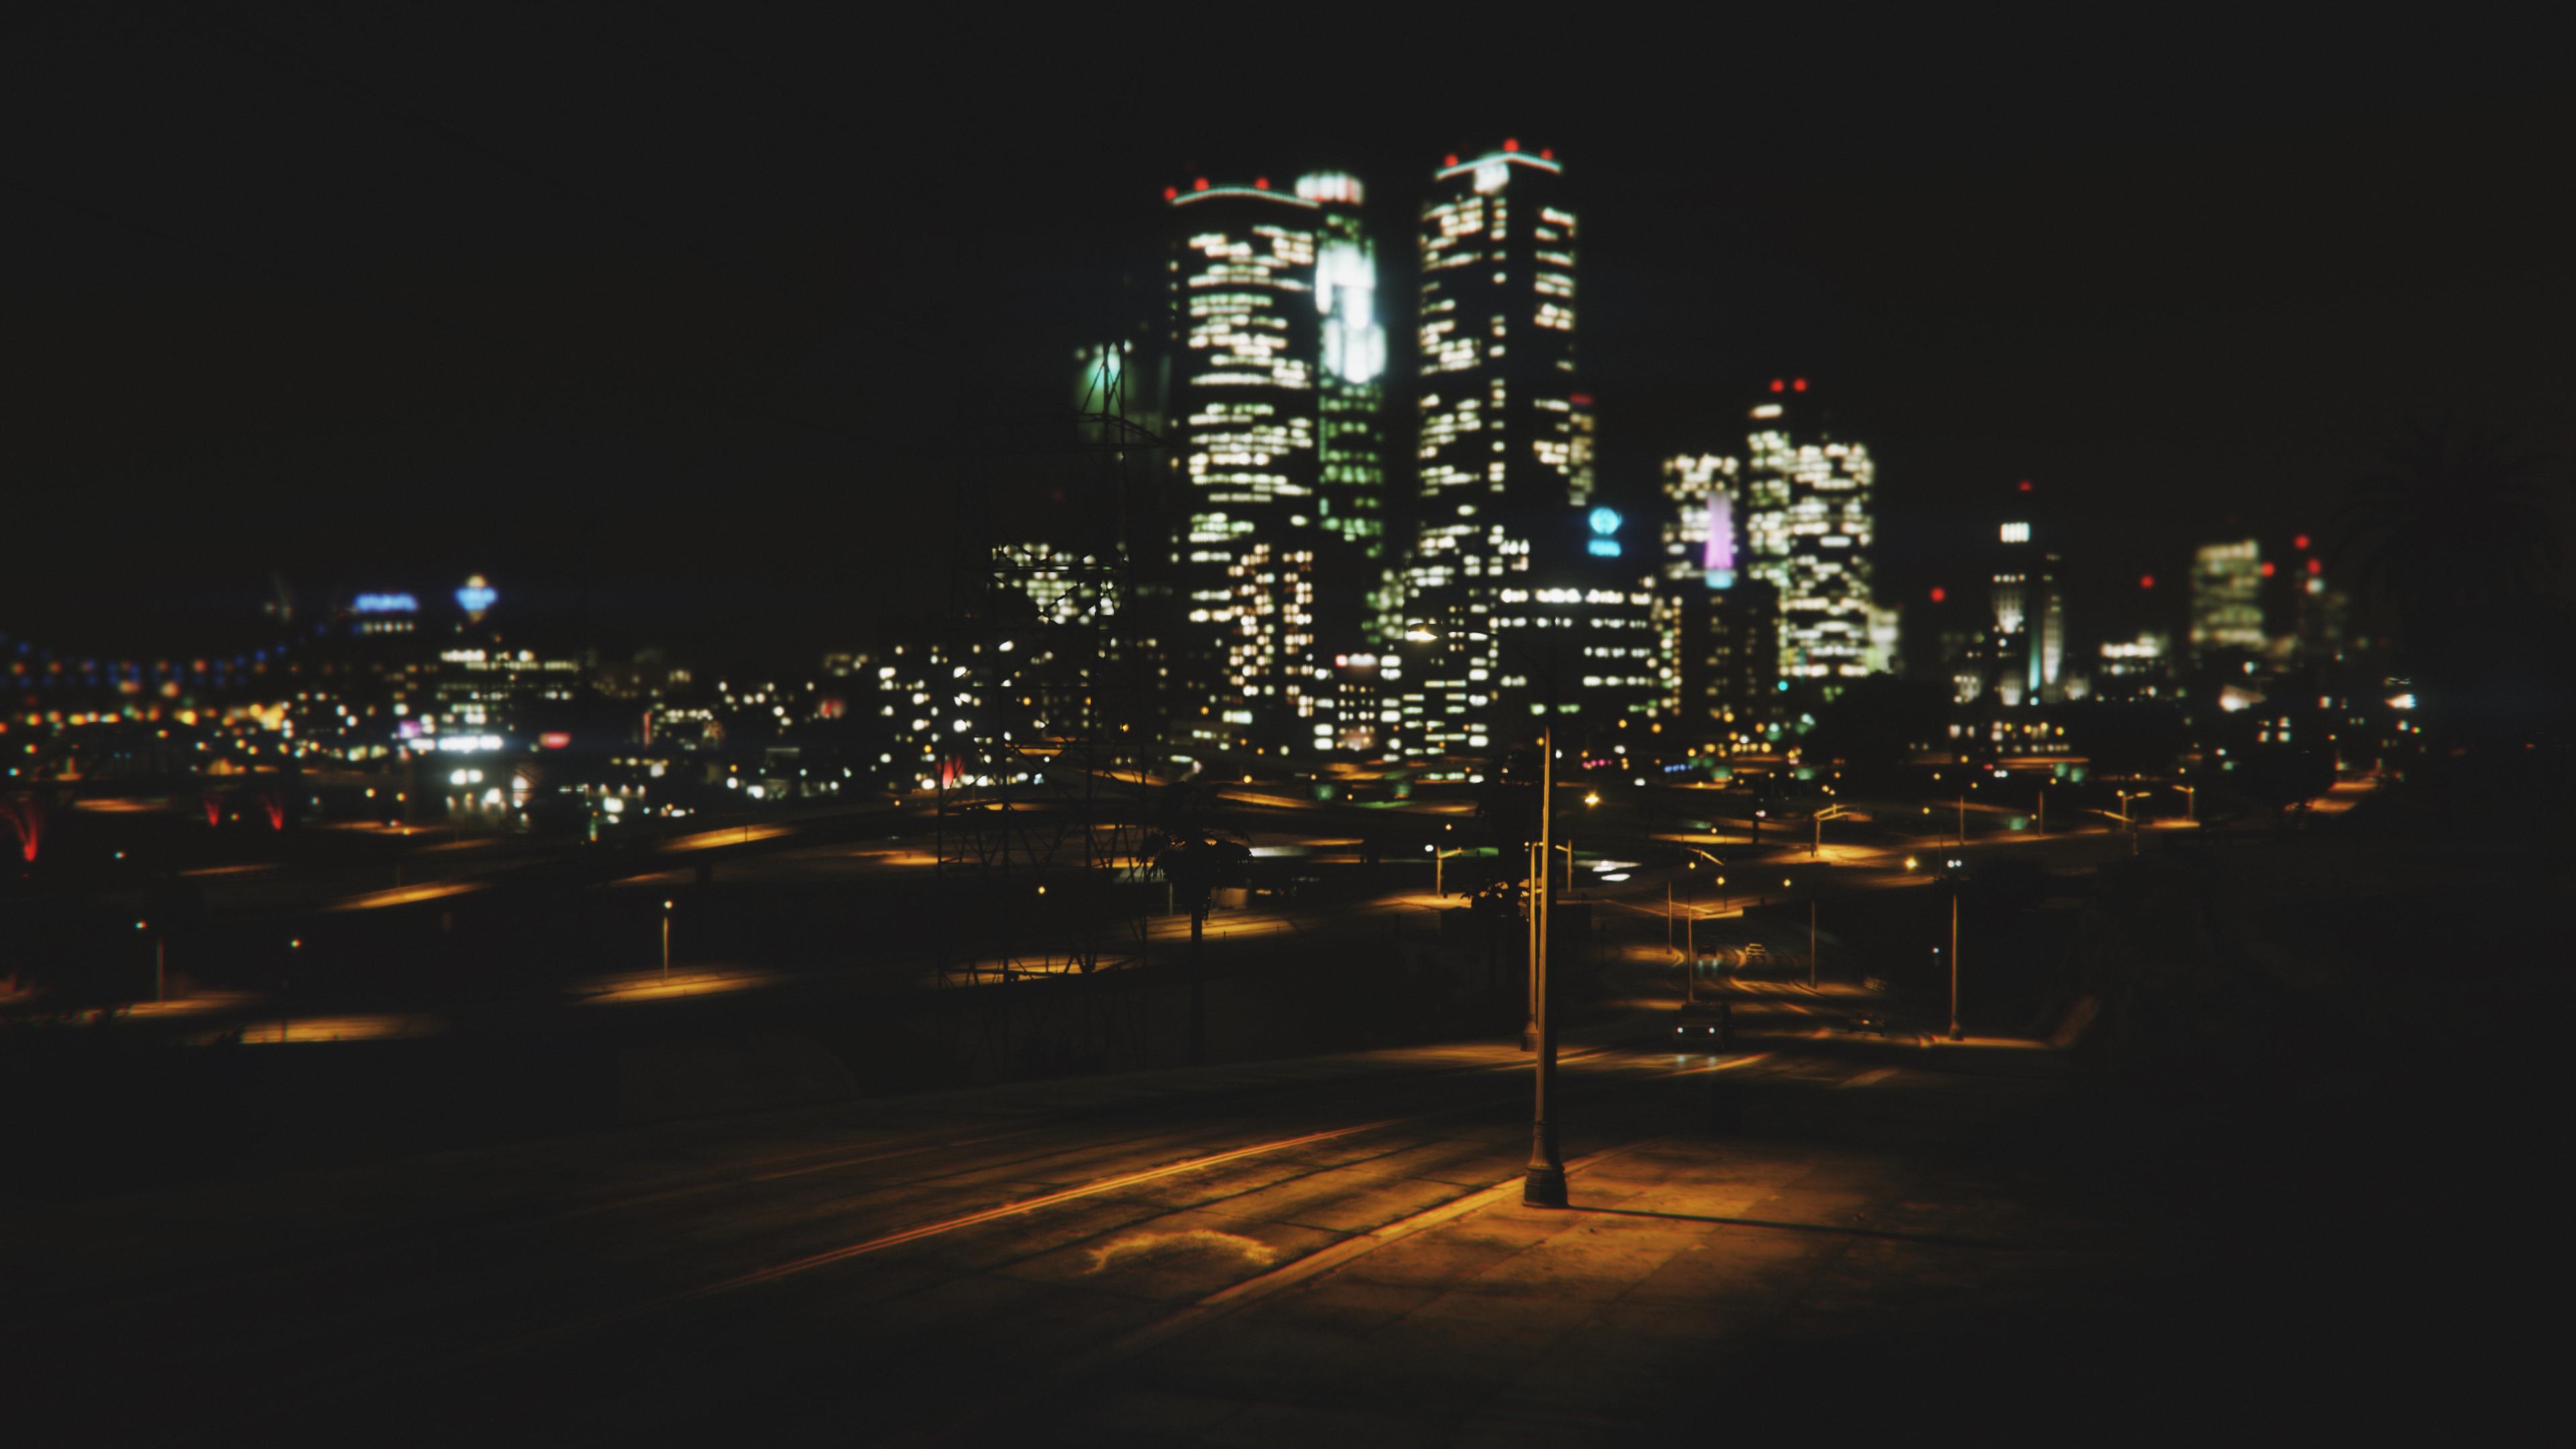 General 3840x2160 night city lights city Grand Theft Auto V GTA5 video games